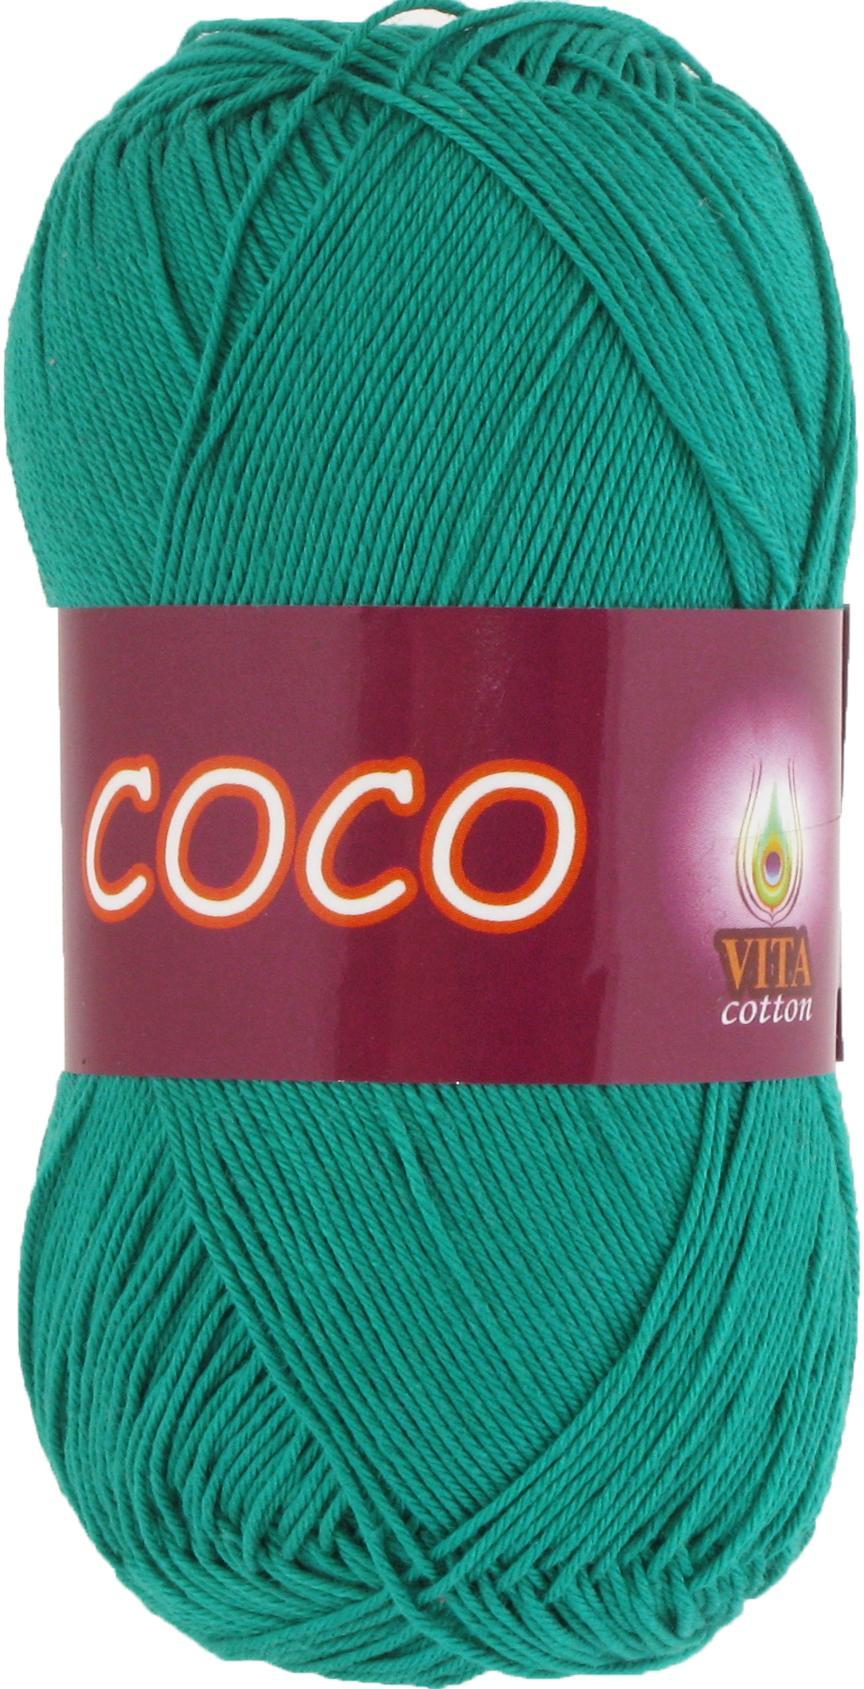 Coco 4310 - зеленая бирюза